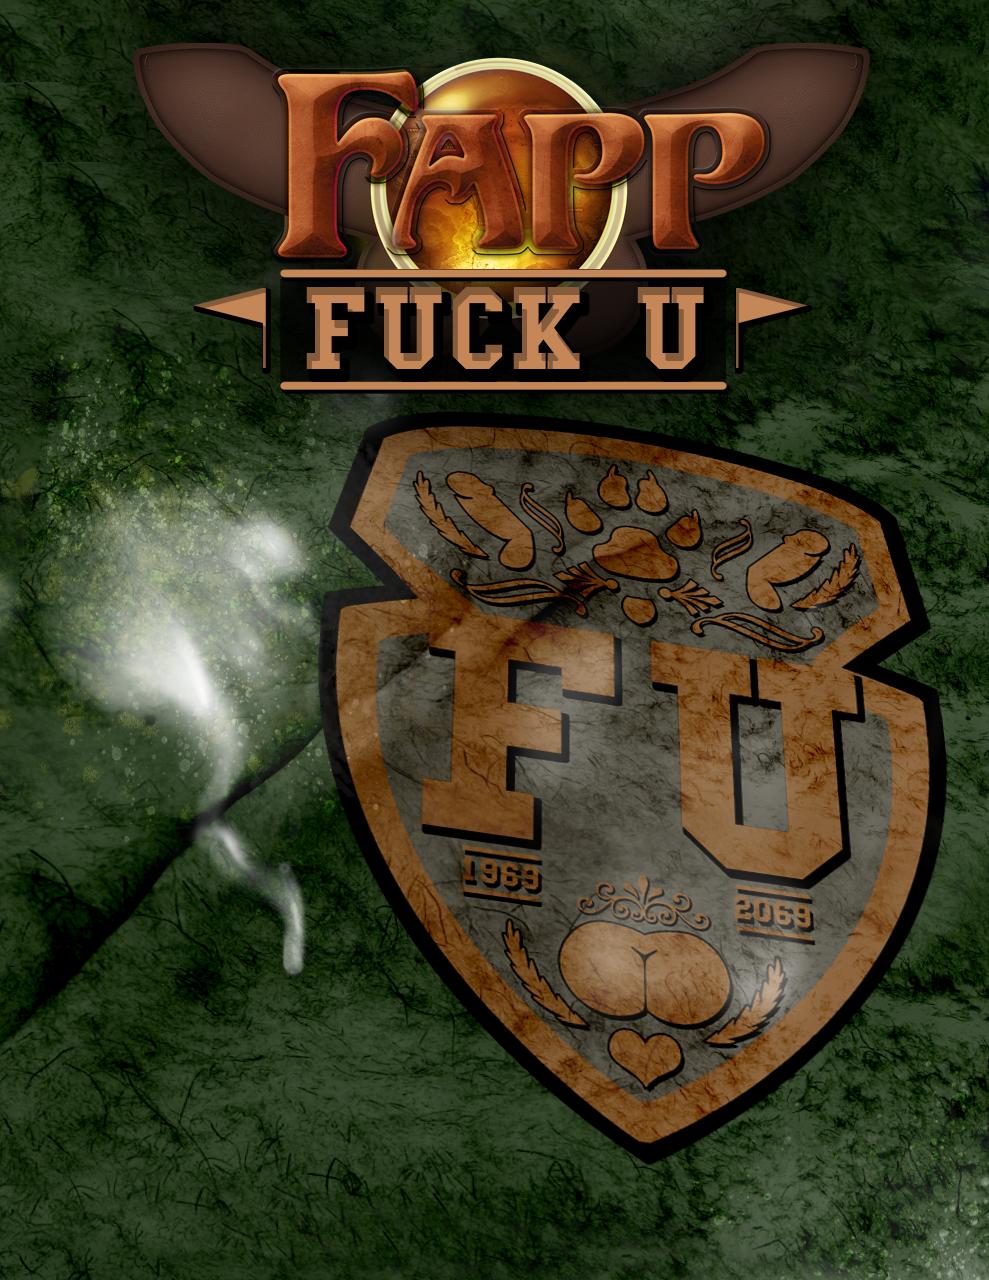 Fapp the FAPP